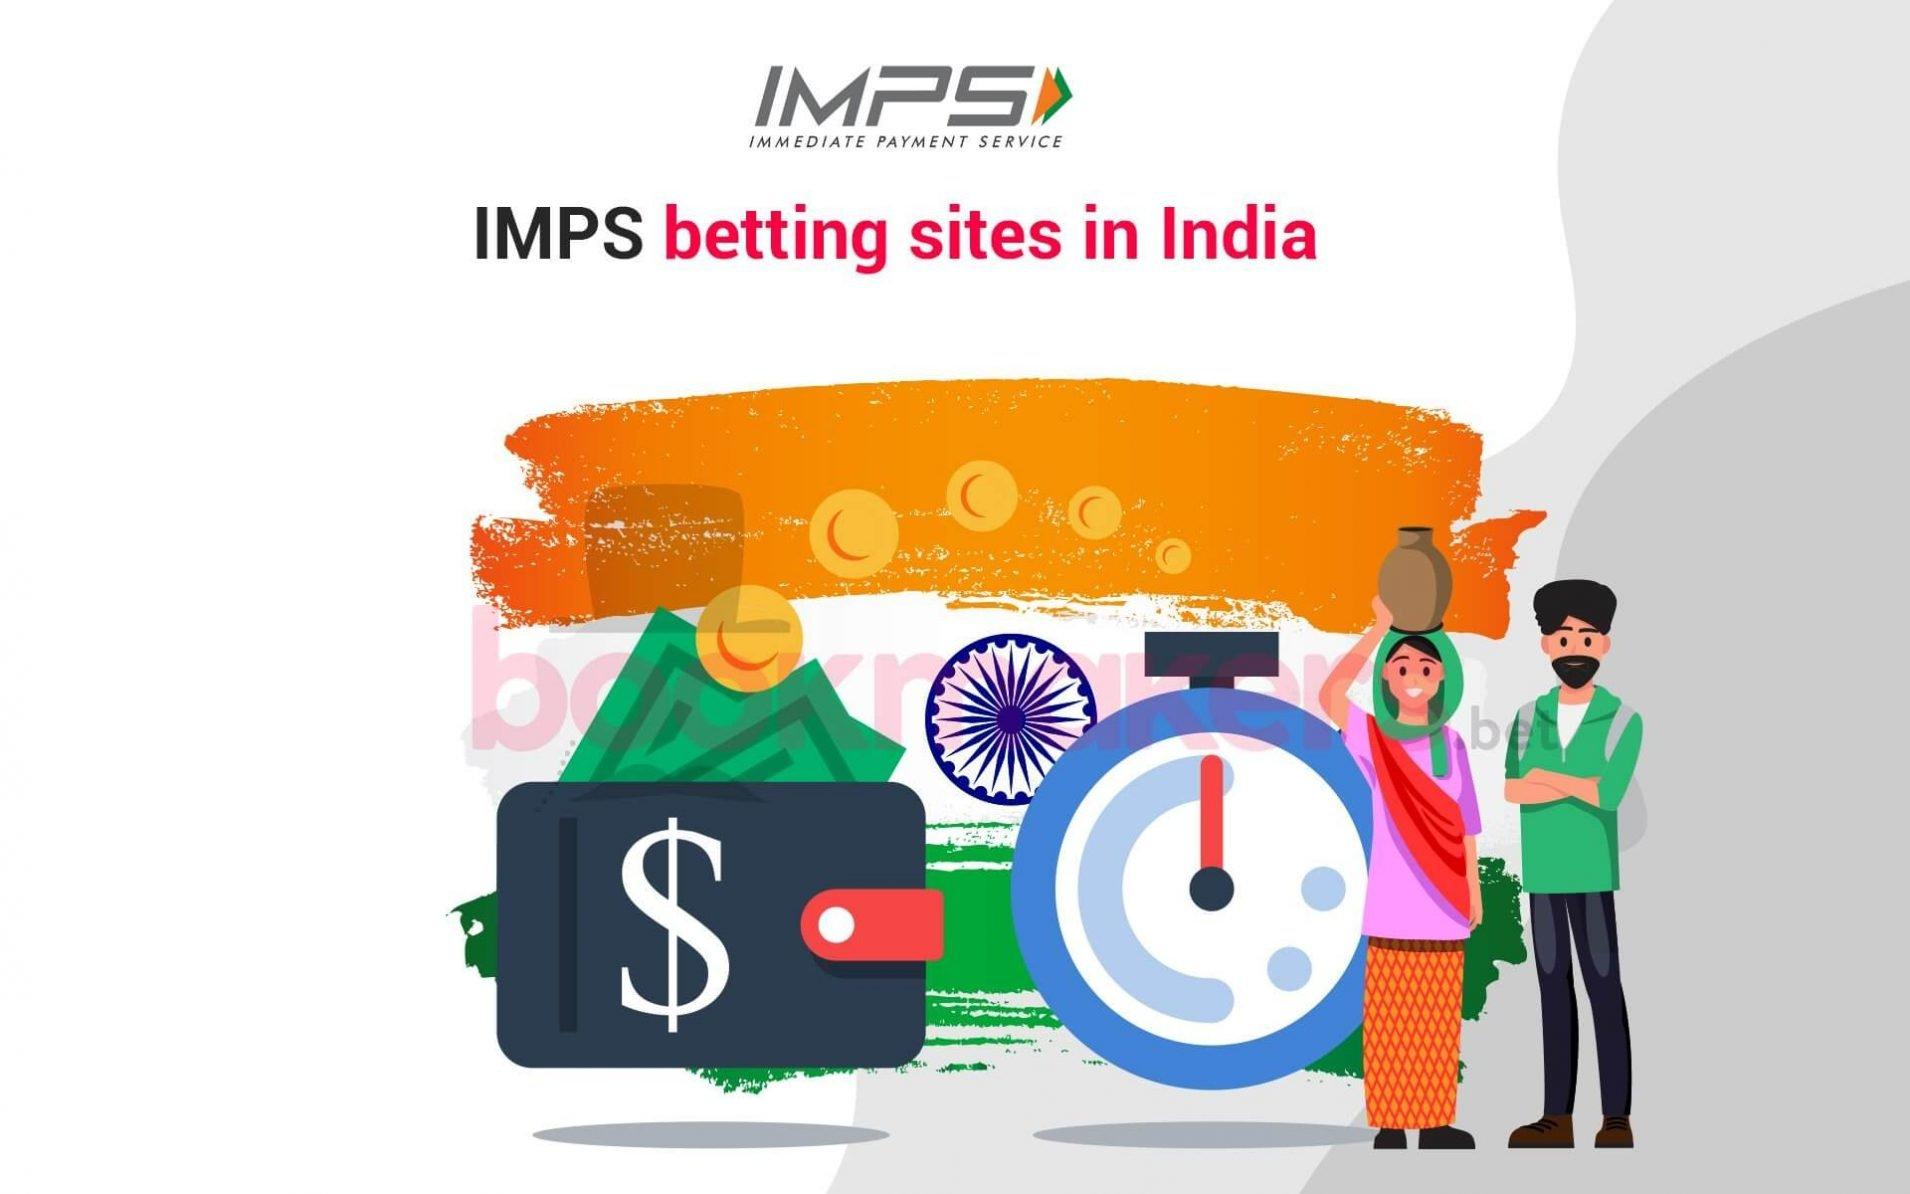 best IMPS UPI betting sites in India